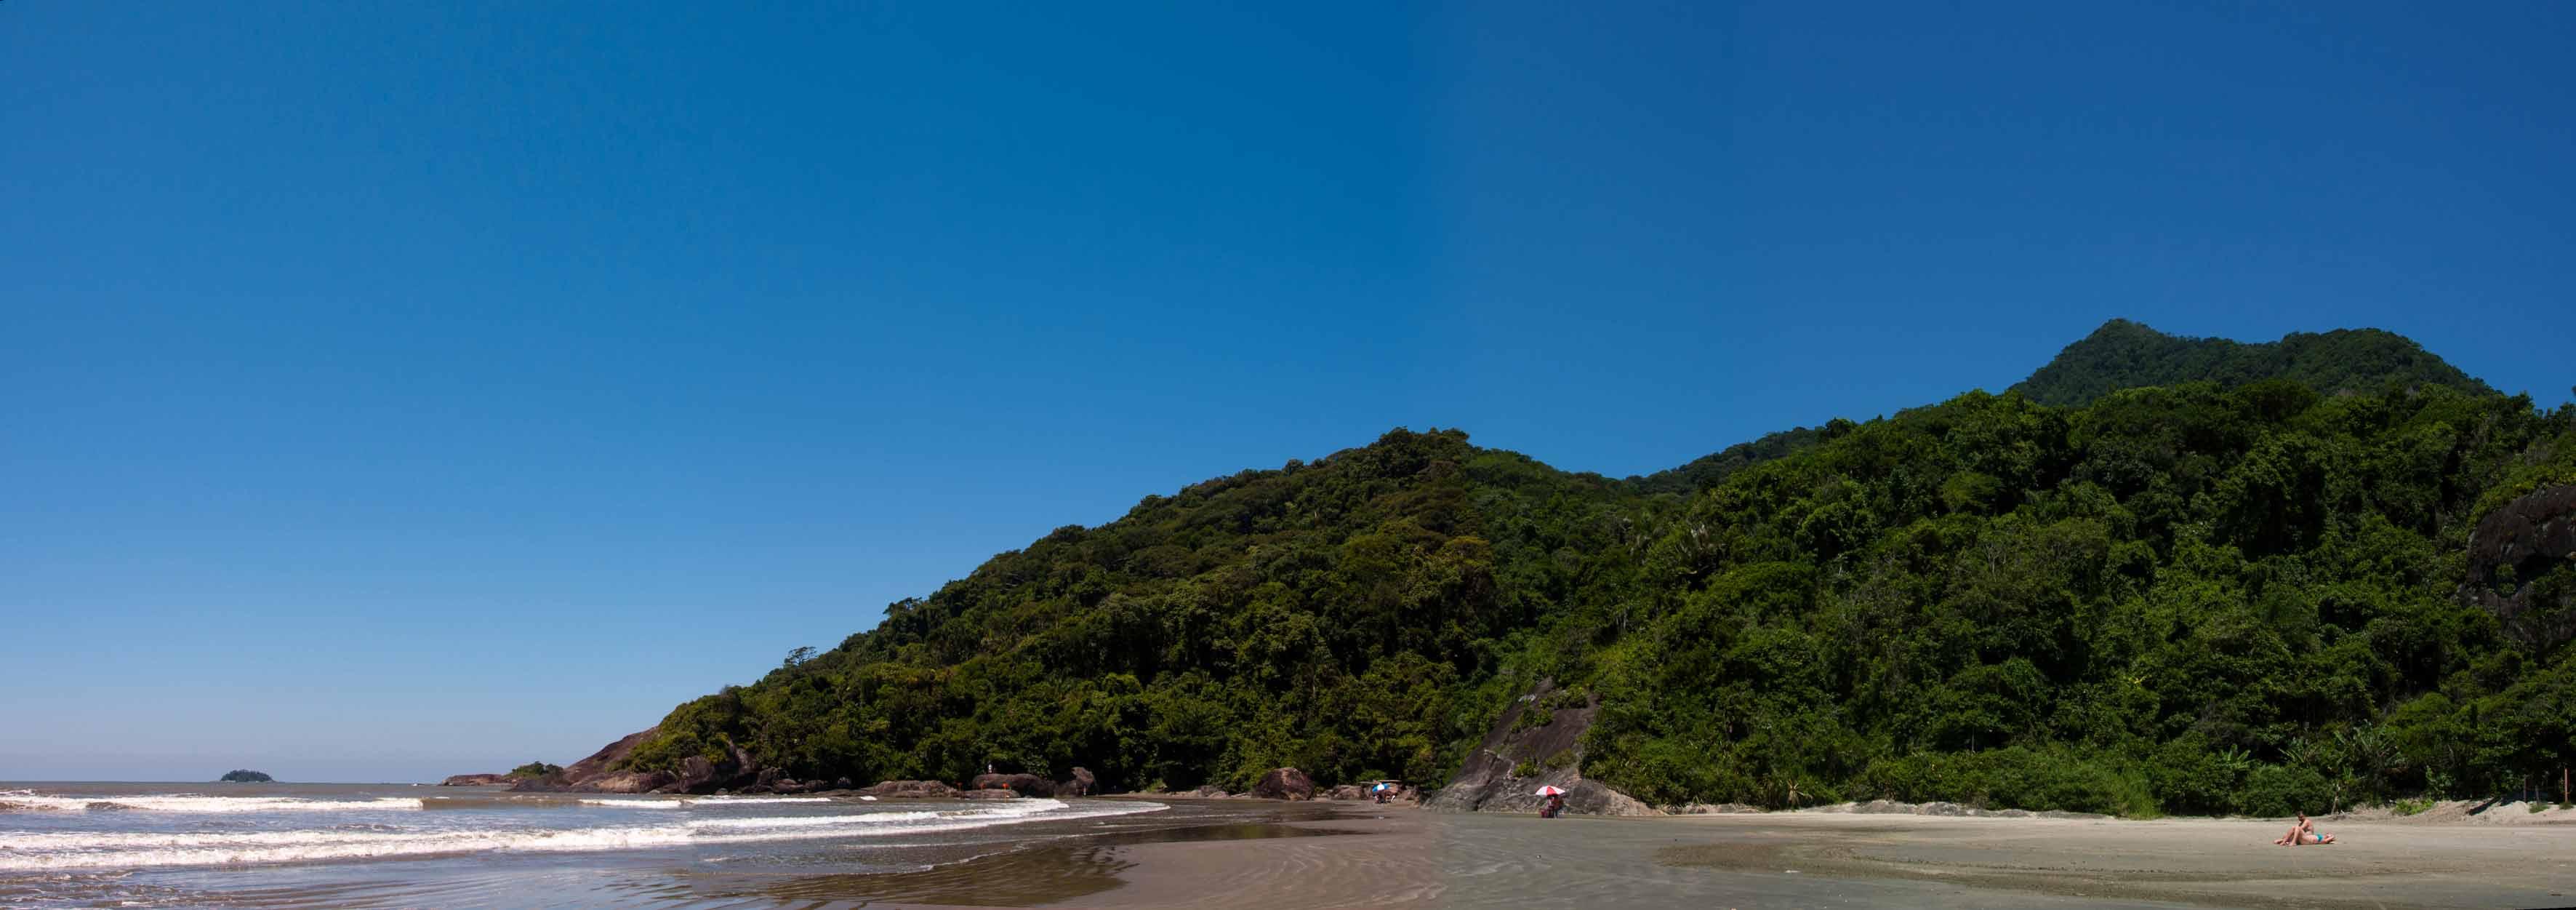 Peruíbe-Meio-Ambiente-Praia-do-Costao-bx